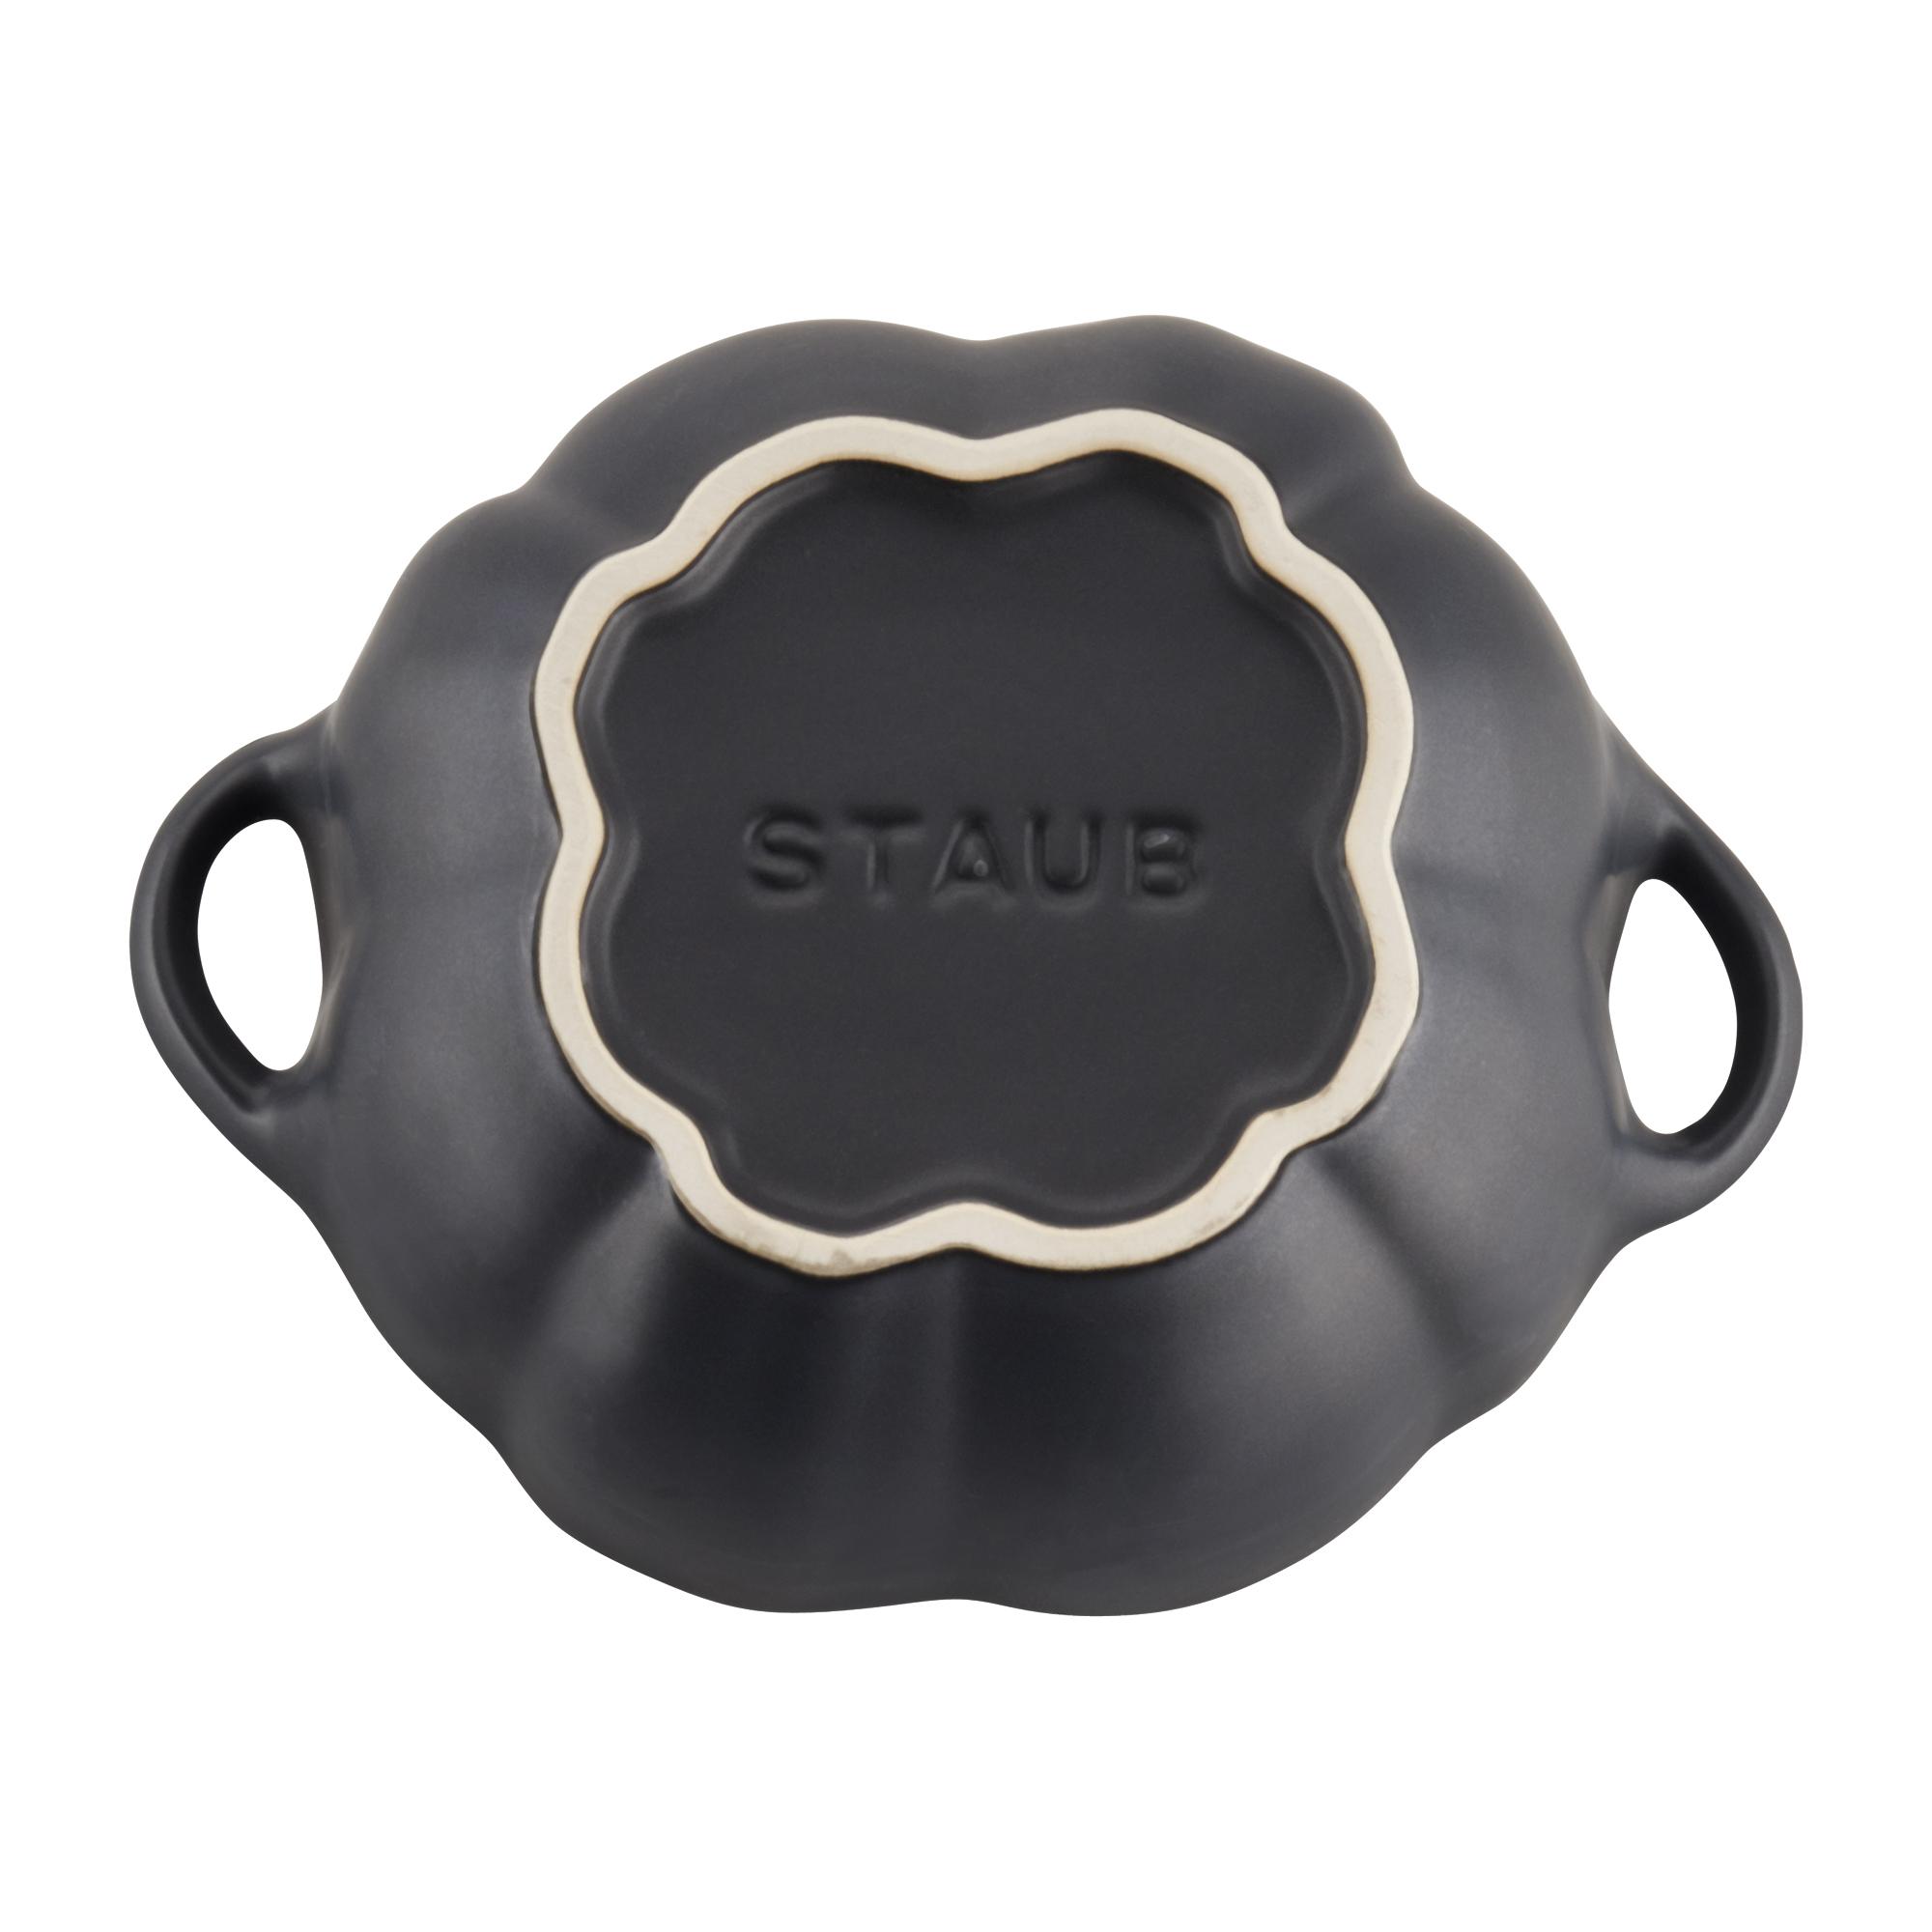 Staub-Ceramic-16-oz-Petite-Pumpkin-Cocotte thumbnail 15